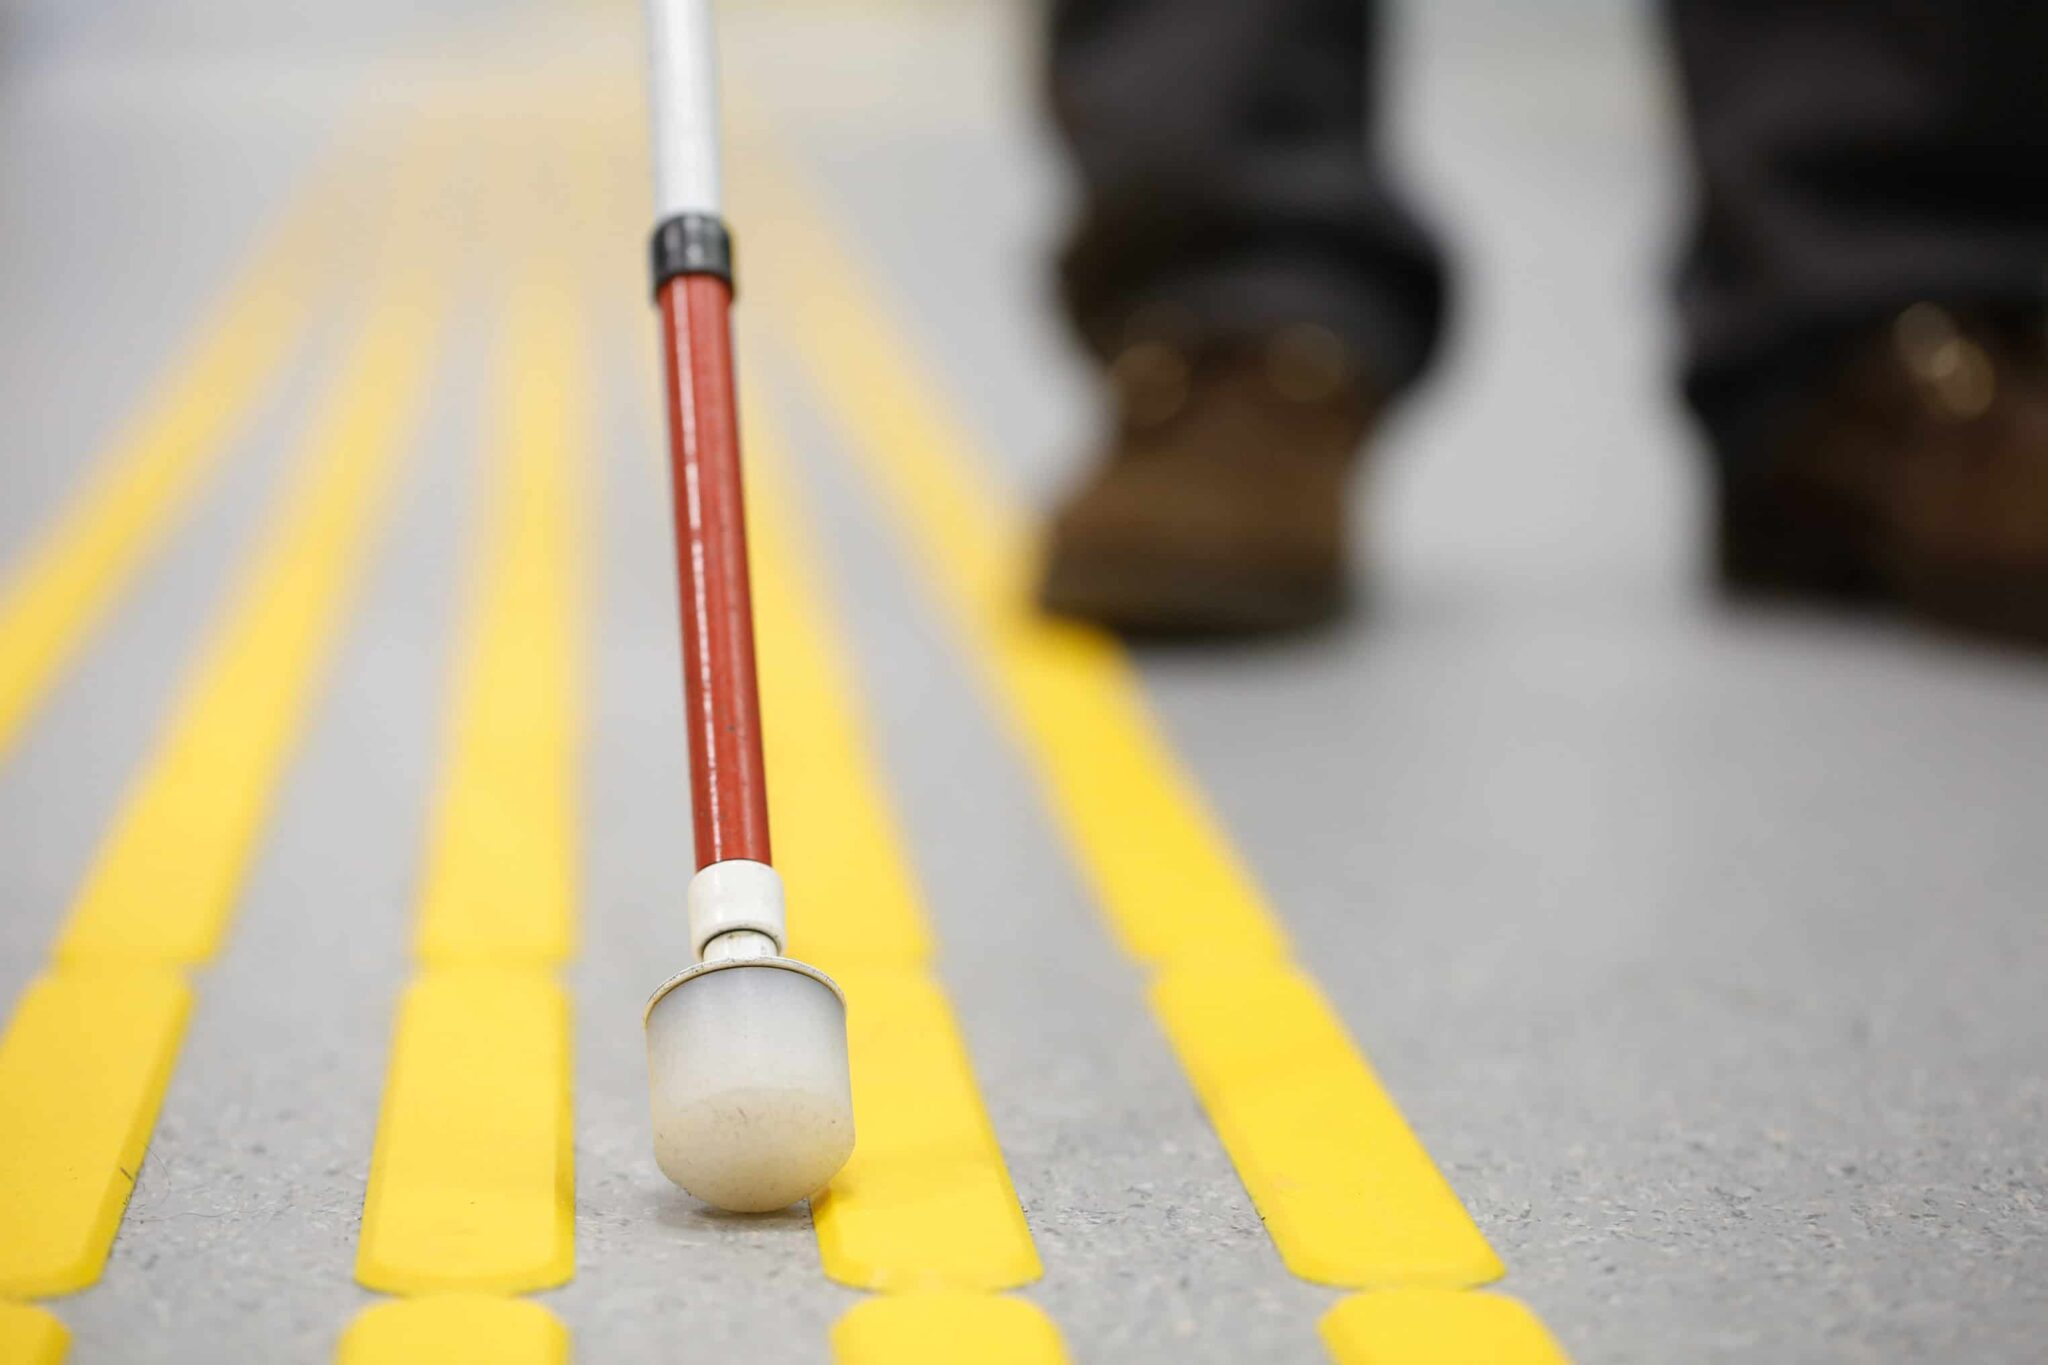 Walking stick touching ground in a crosswalk